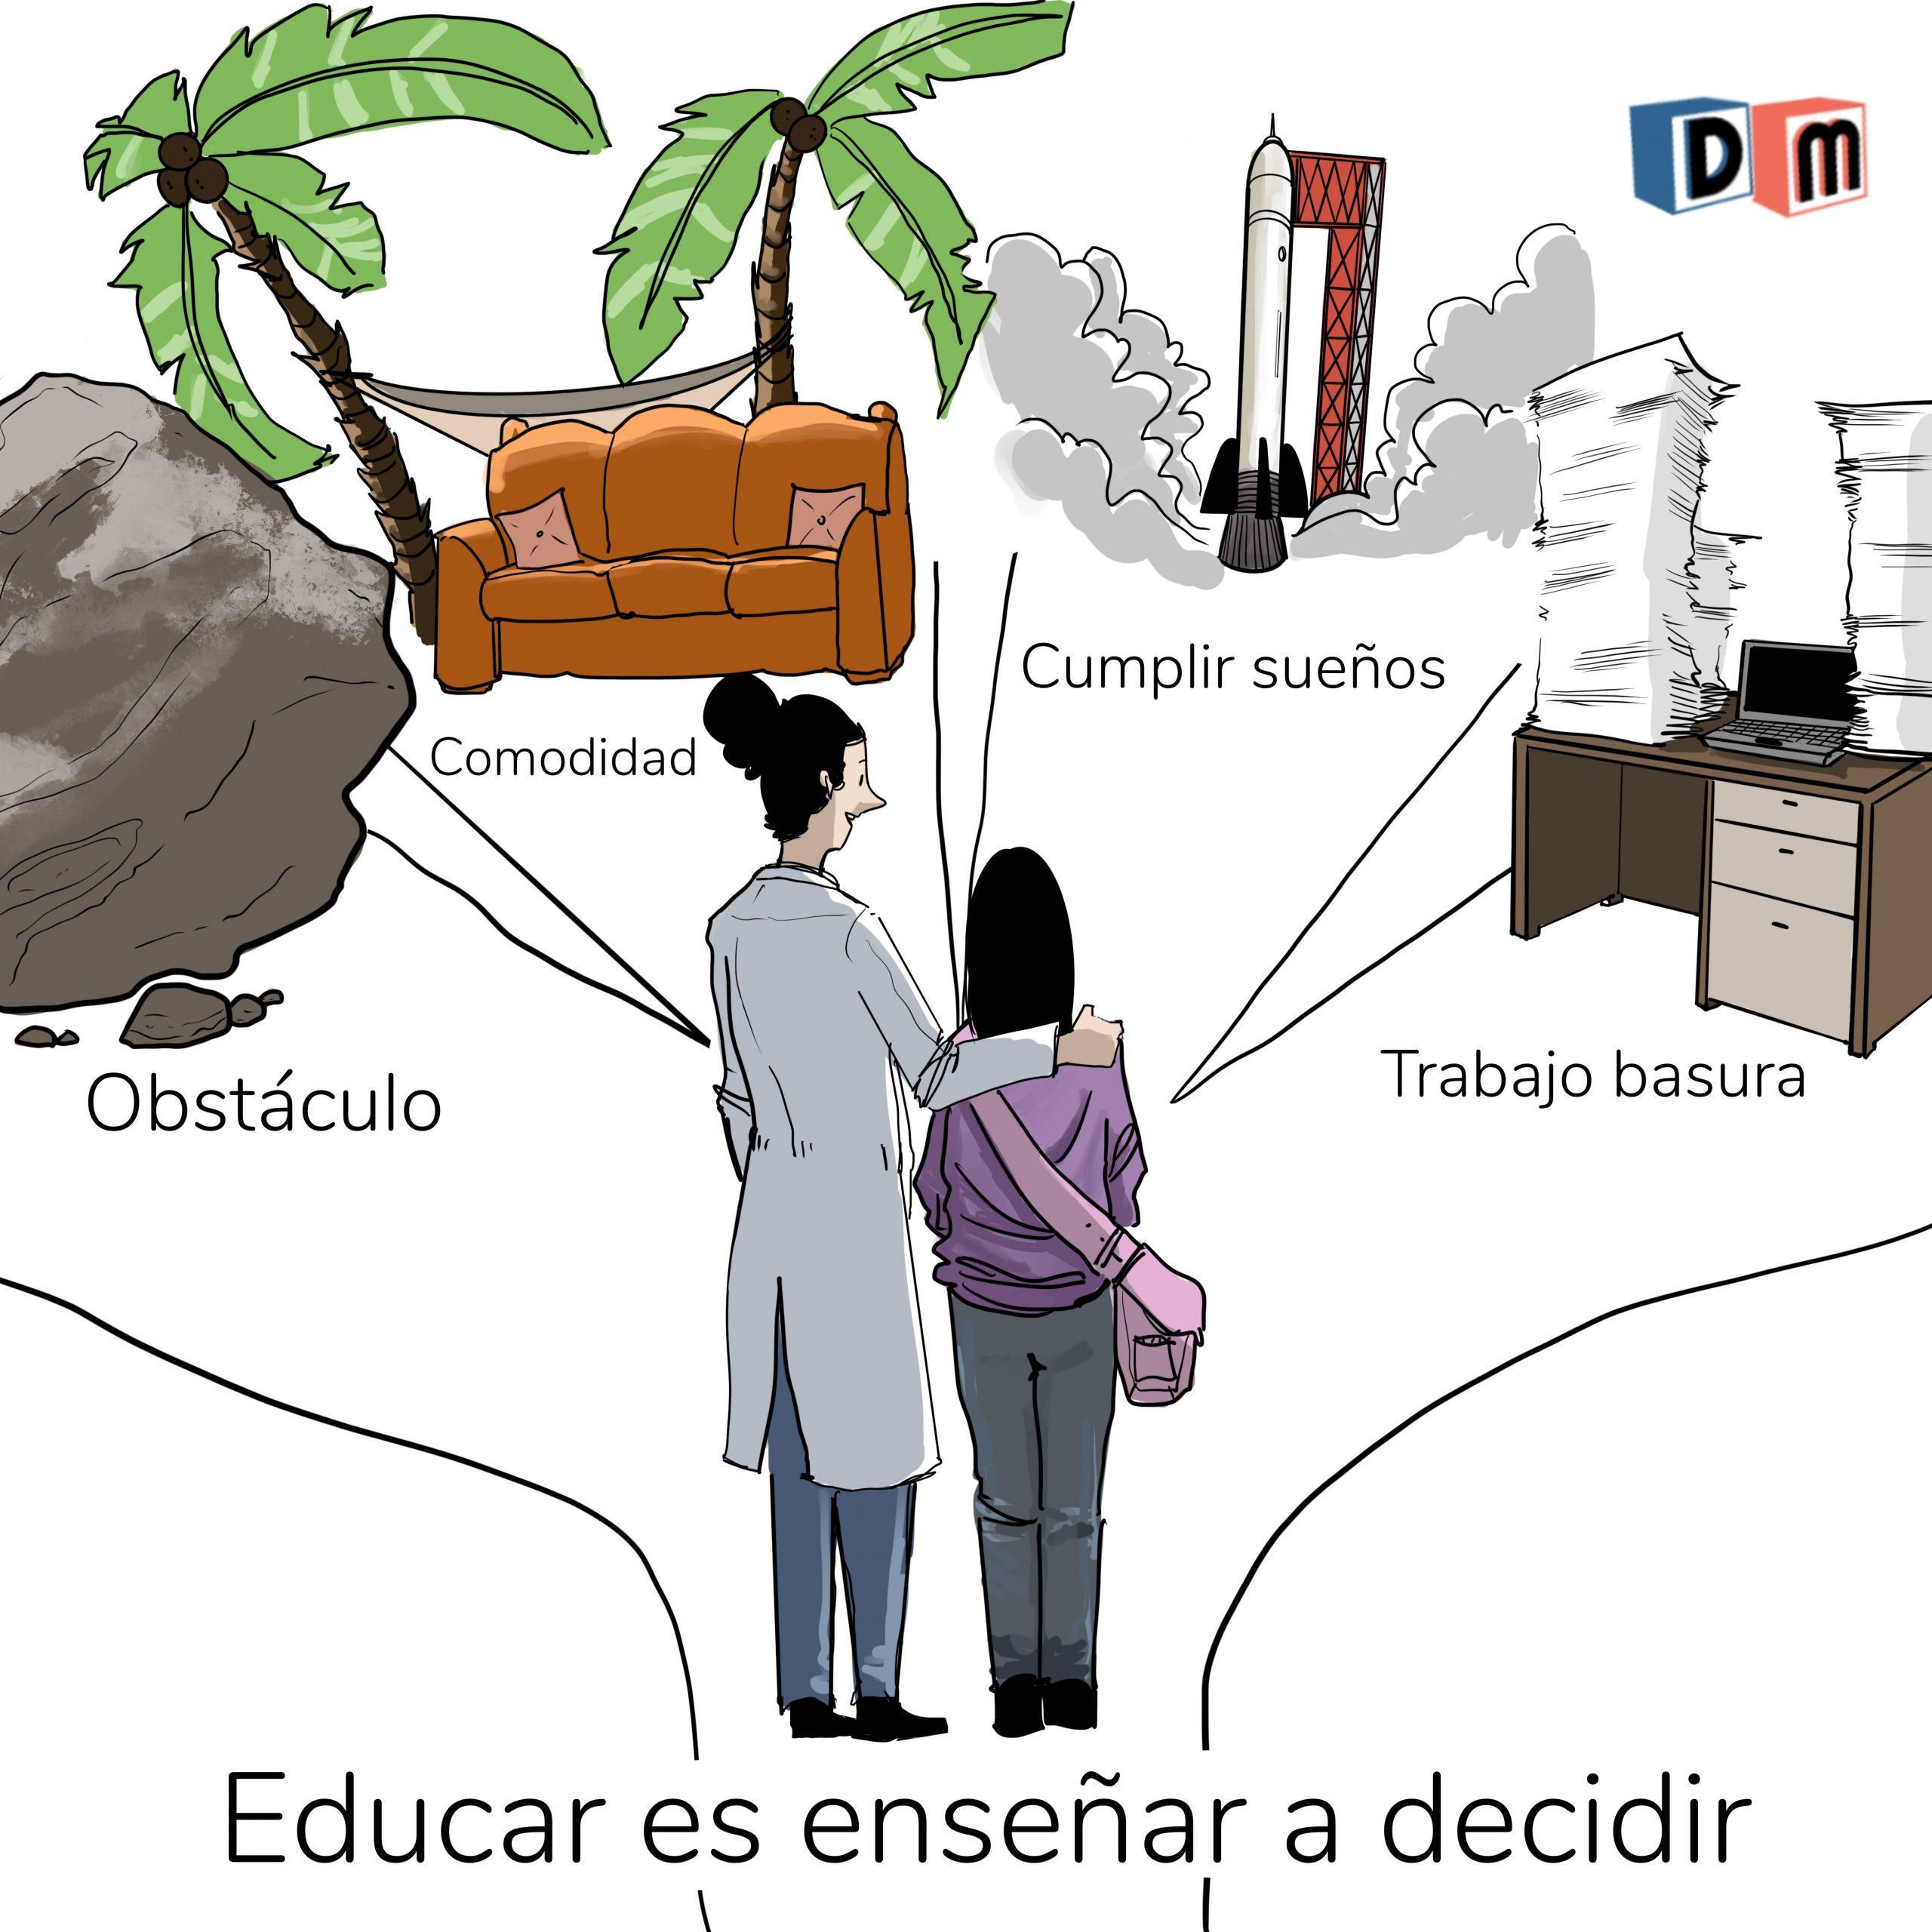 David Mora_Viñeta 14_Educar es enseñar a decidir